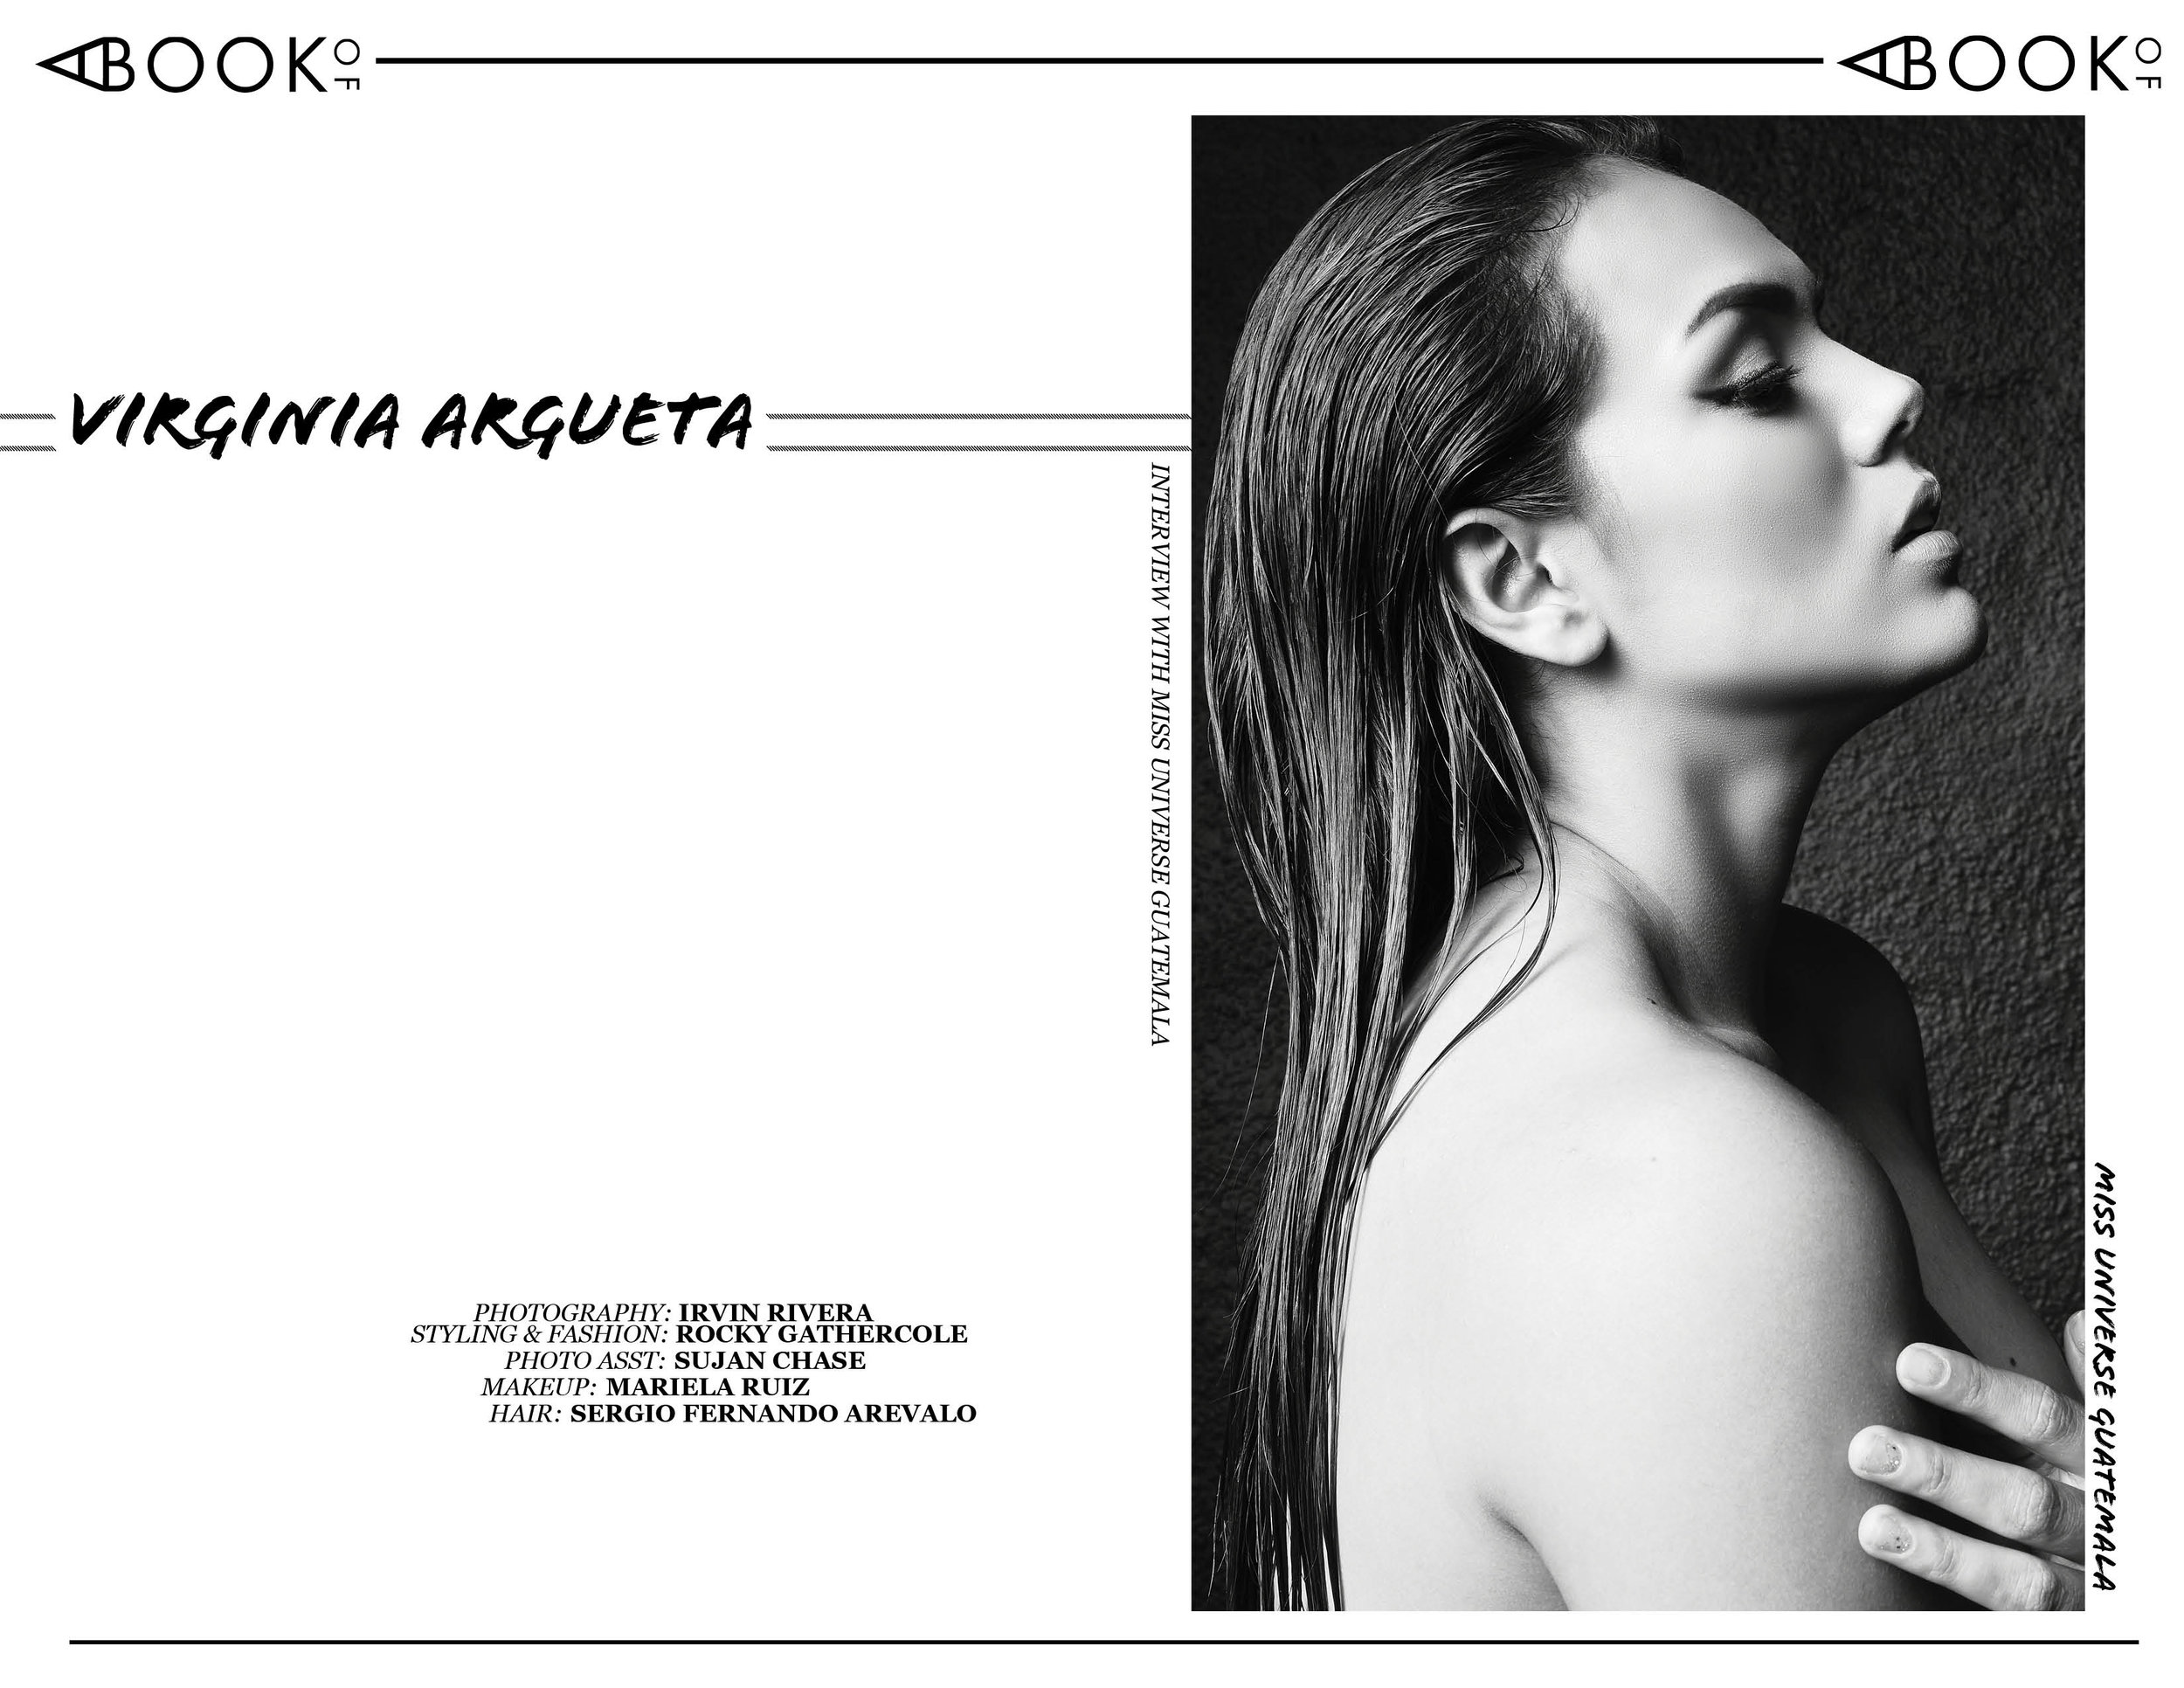 Virginia Argueta Pages.jpg